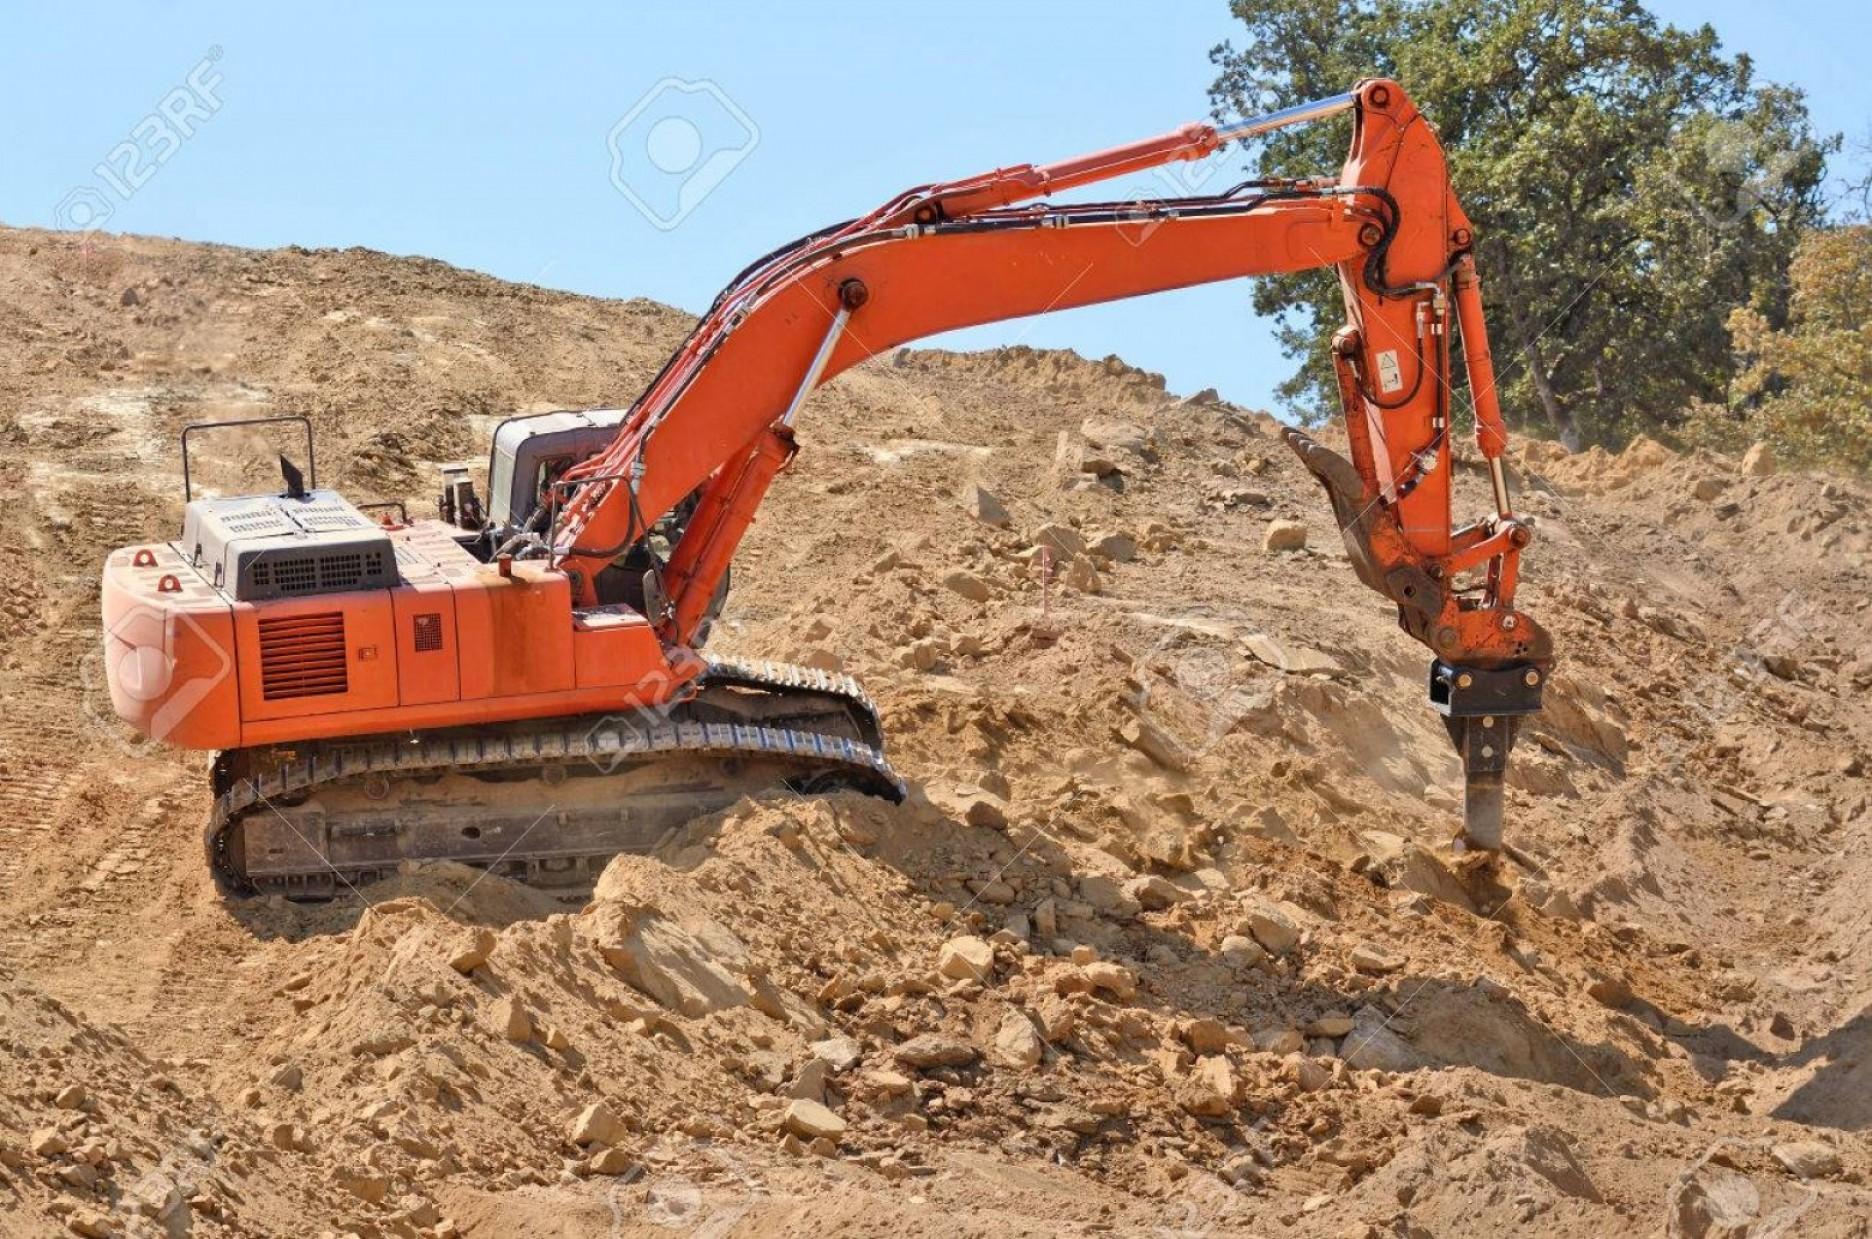 Photolarge track hoe using. Excavator clipart rock quarry